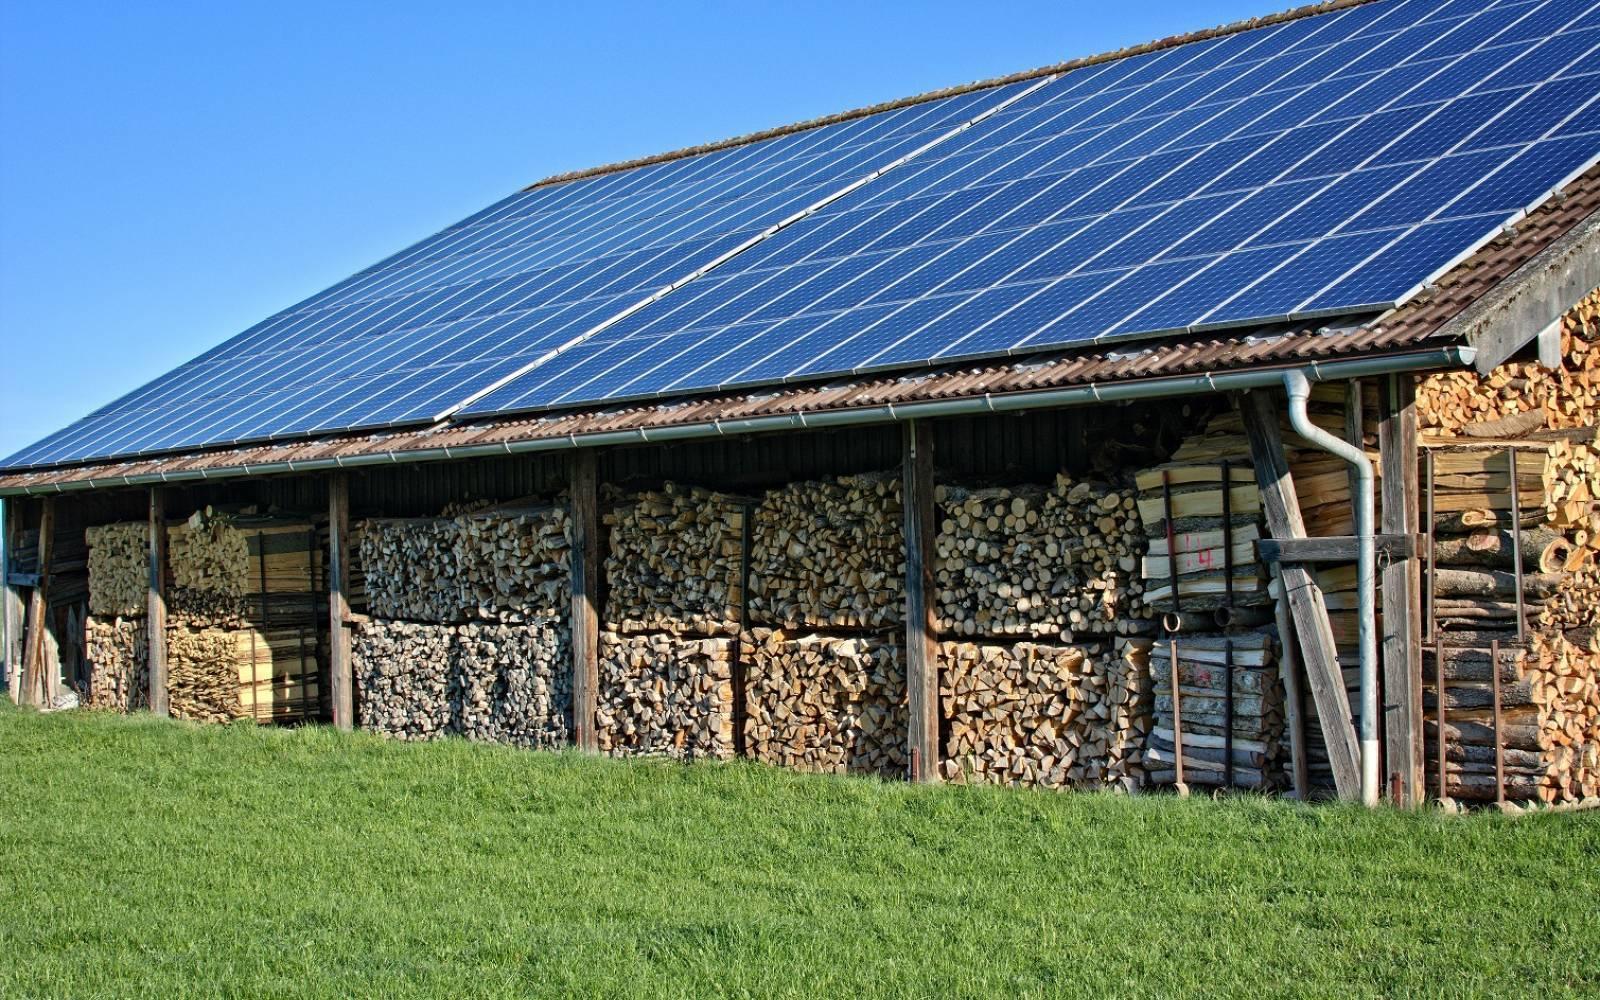 energia elettrica ecologica energia pulita per ogni ForDomestica In Svizzera